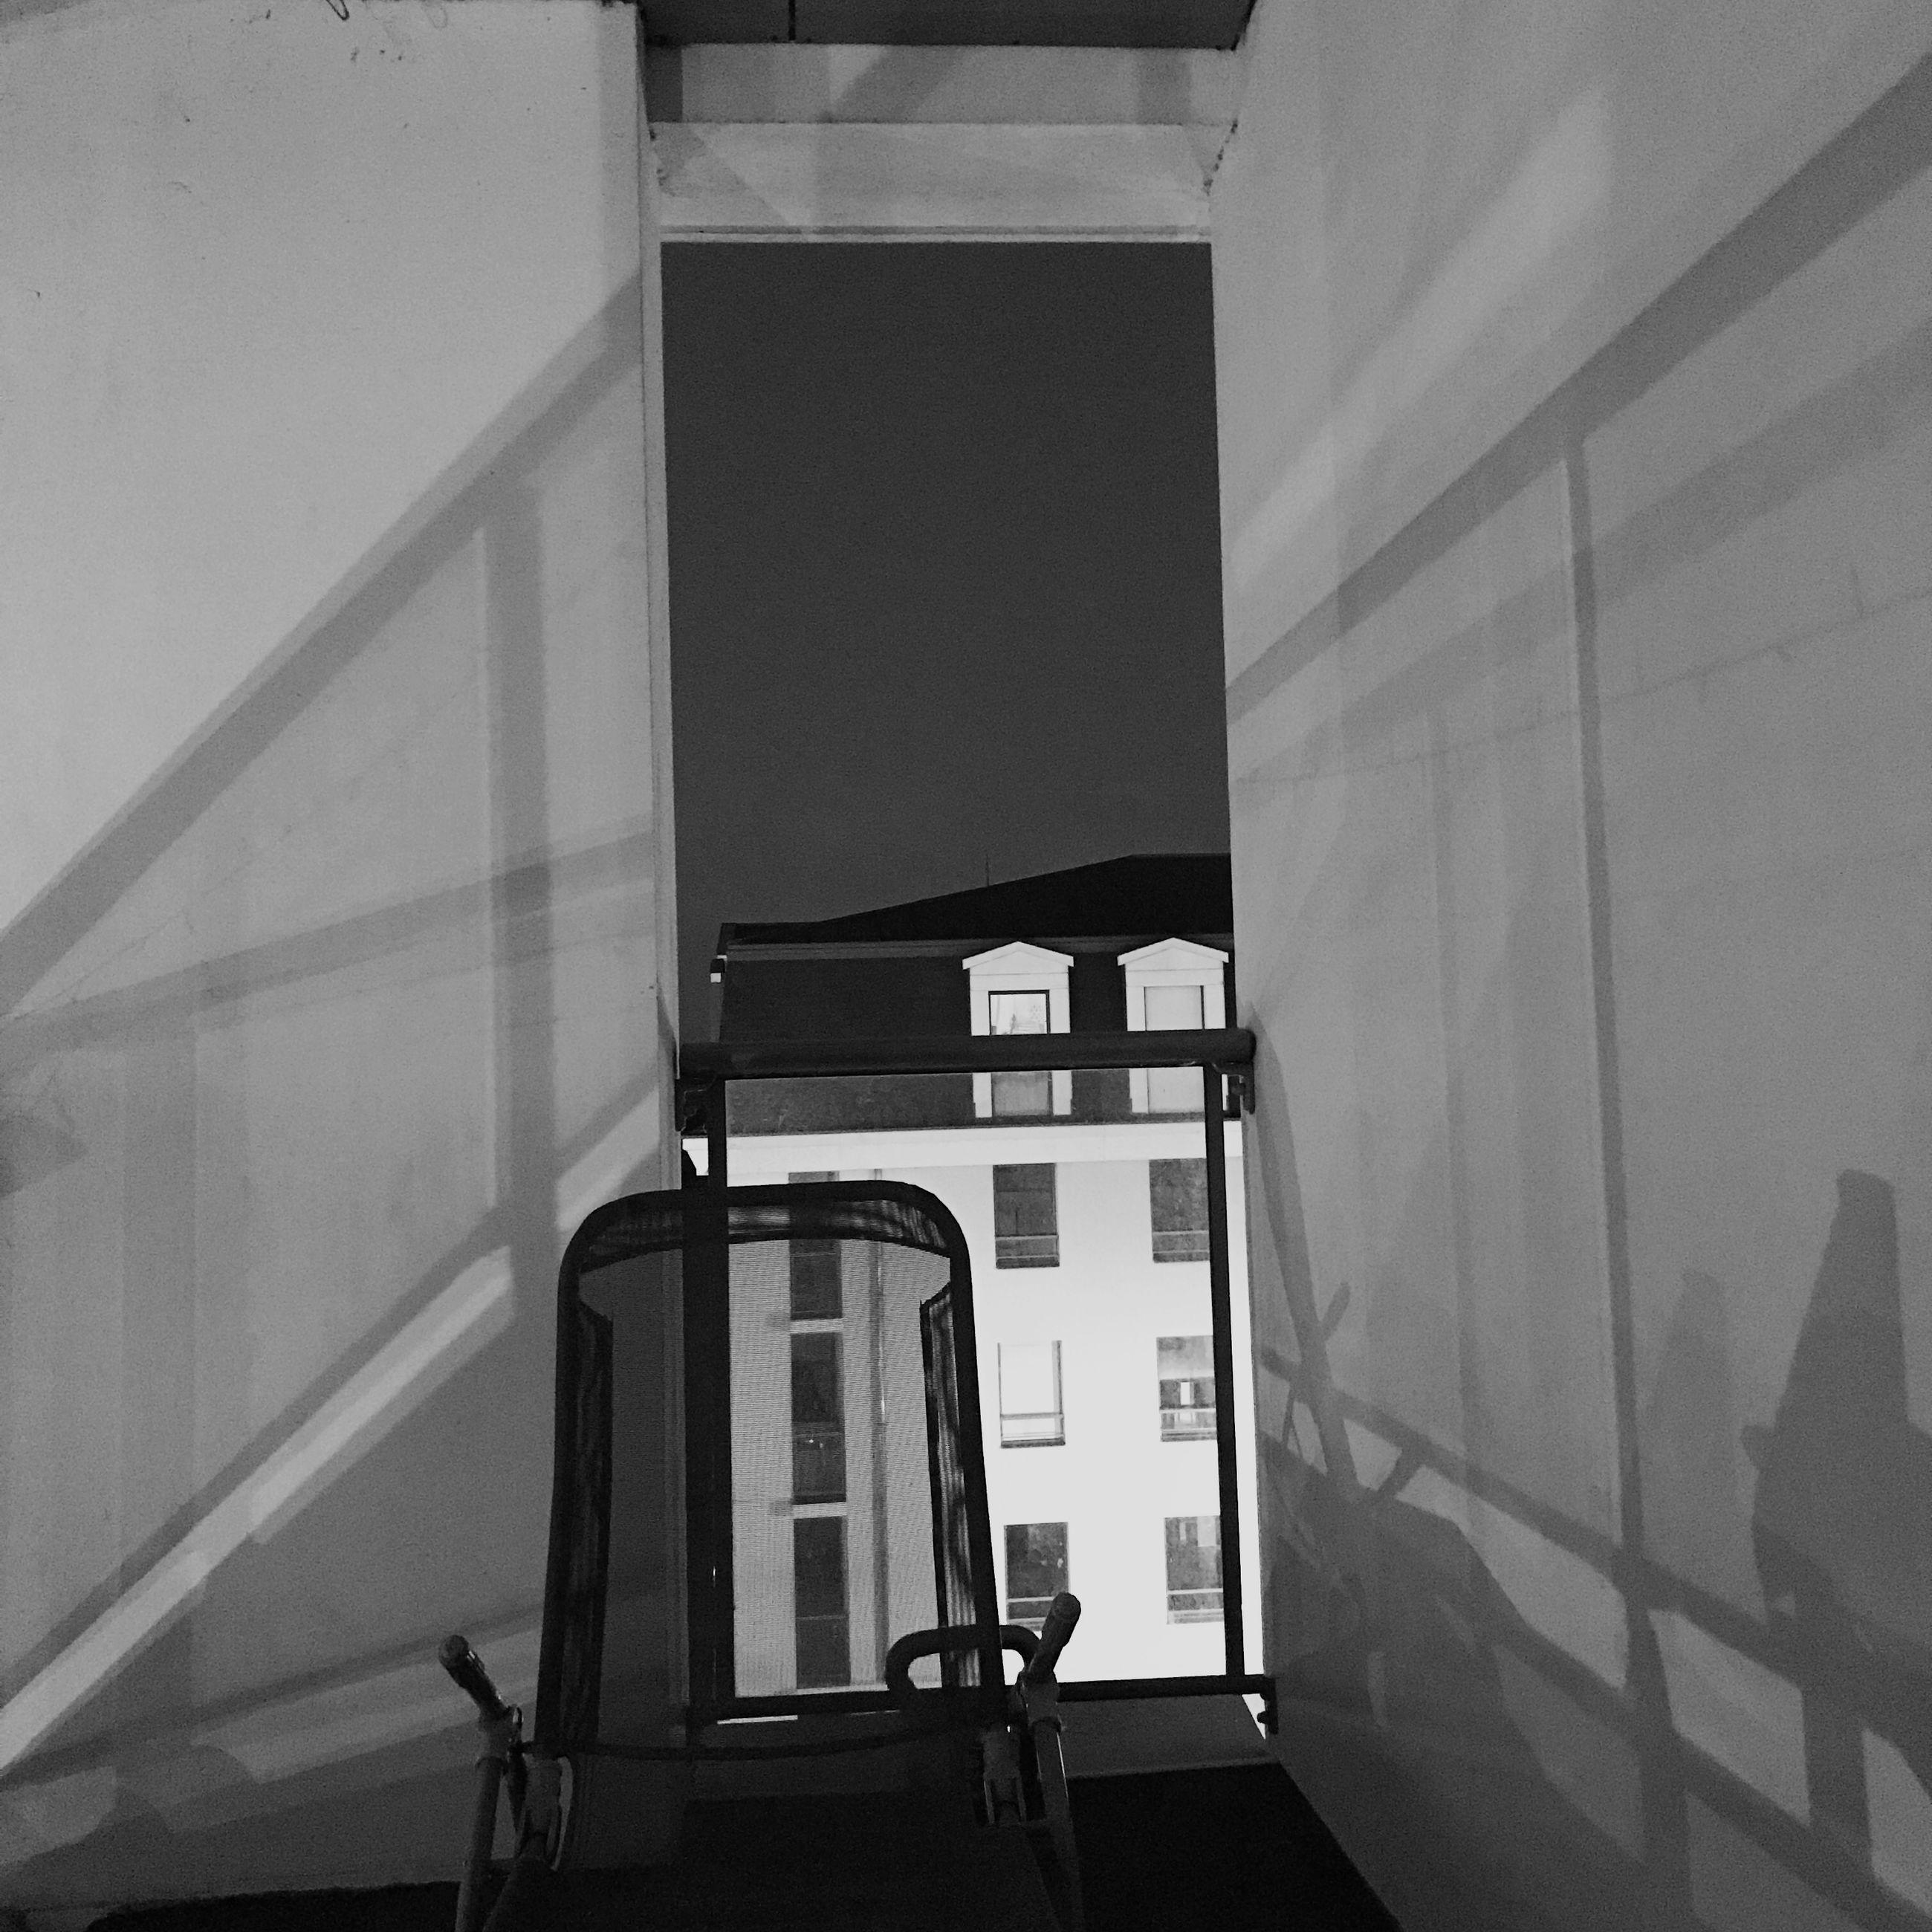 white, black, black and white, architecture, monochrome, monochrome photography, built structure, no people, light, transportation, building exterior, day, interior design